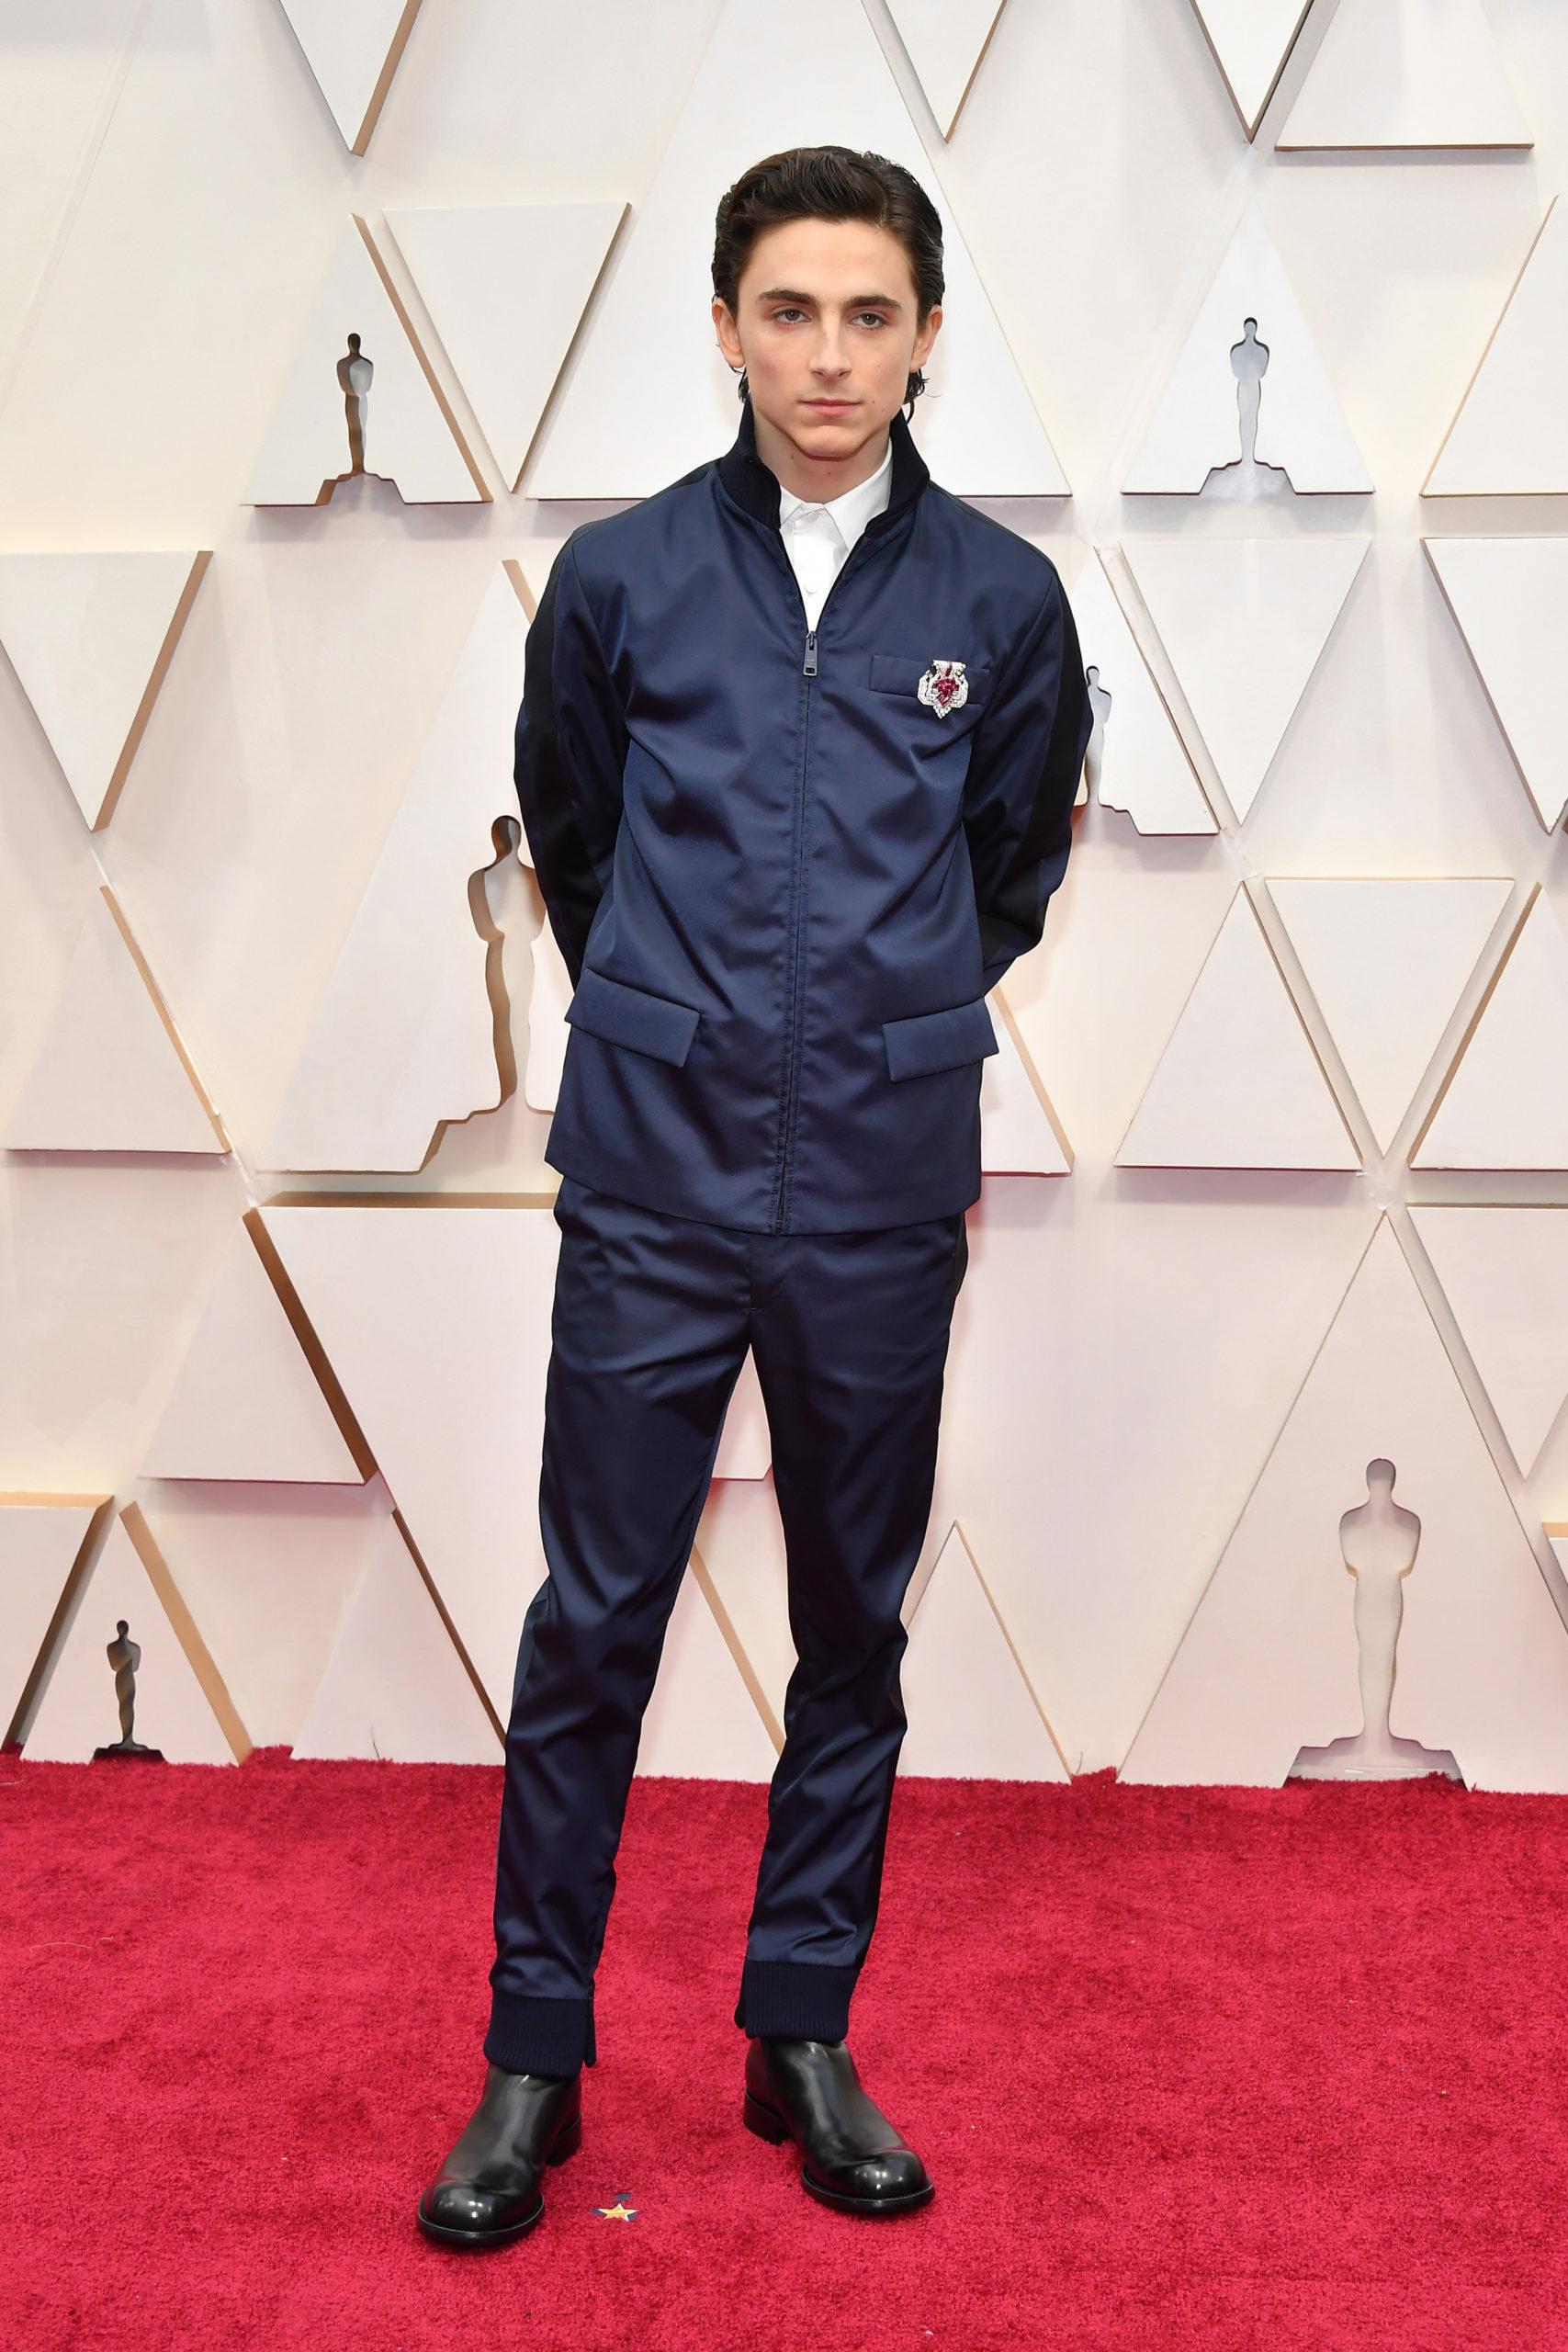 Oscars 2020 - Timothée Chalamet